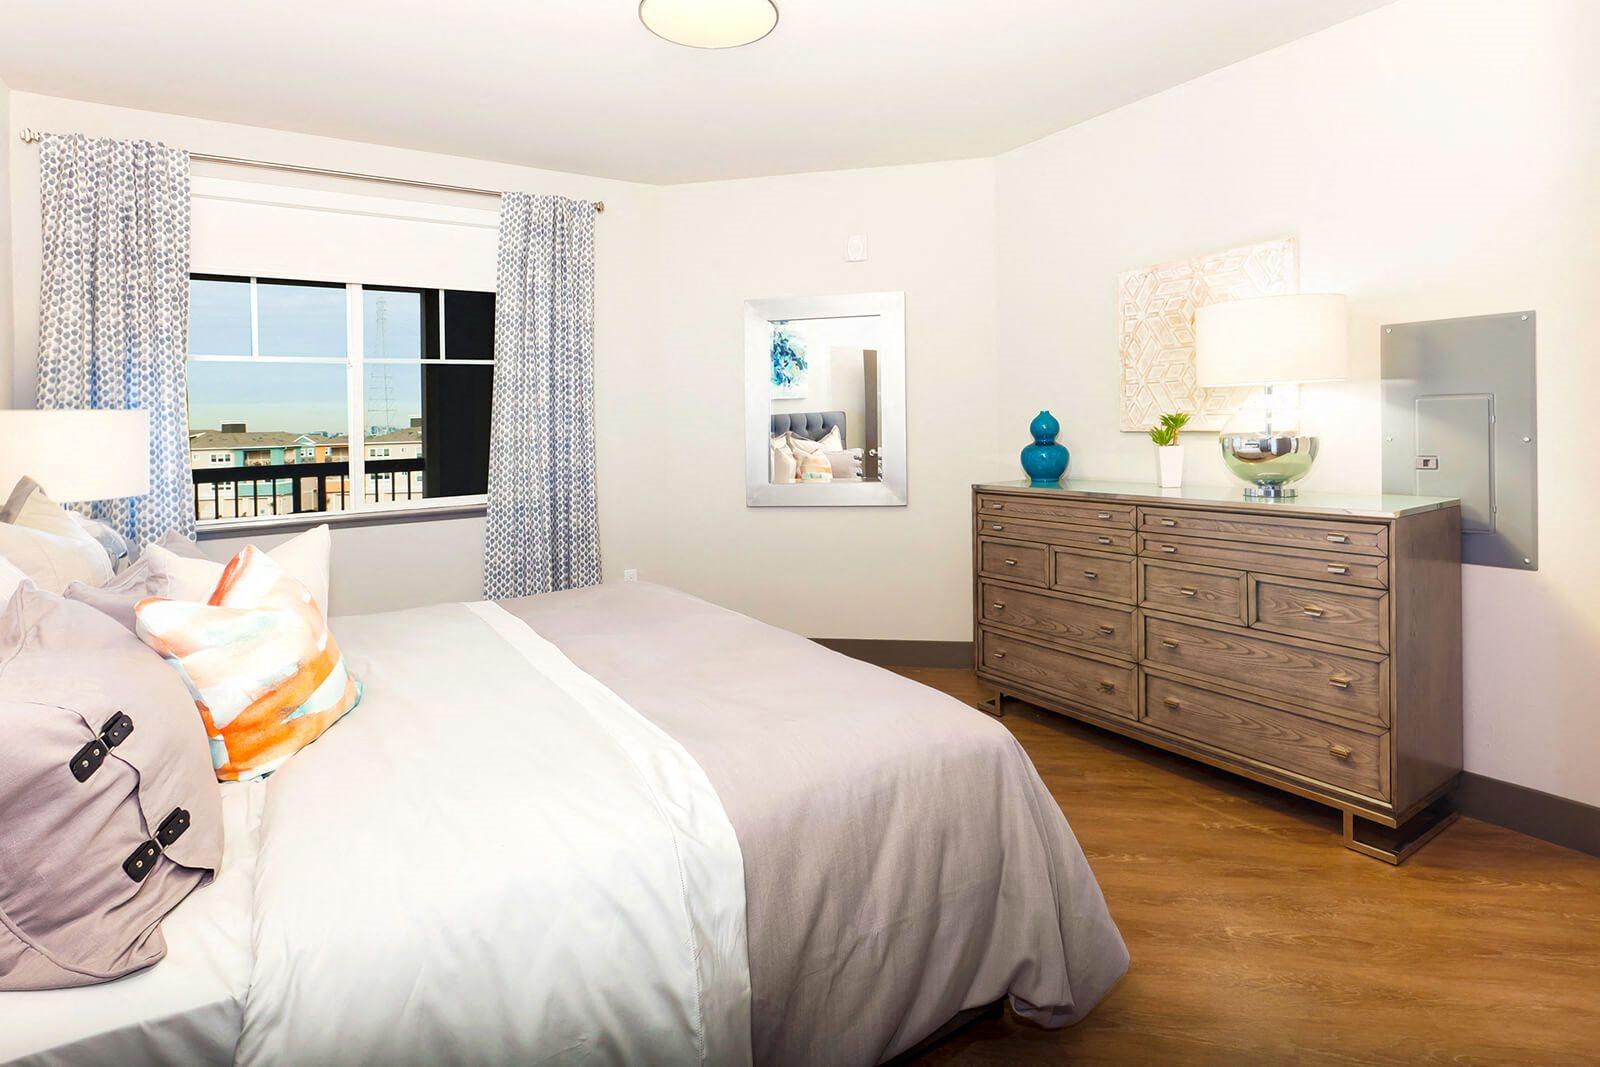 Spacious Bedroom at Blu Harbor by Windsor, Redwood City, CA